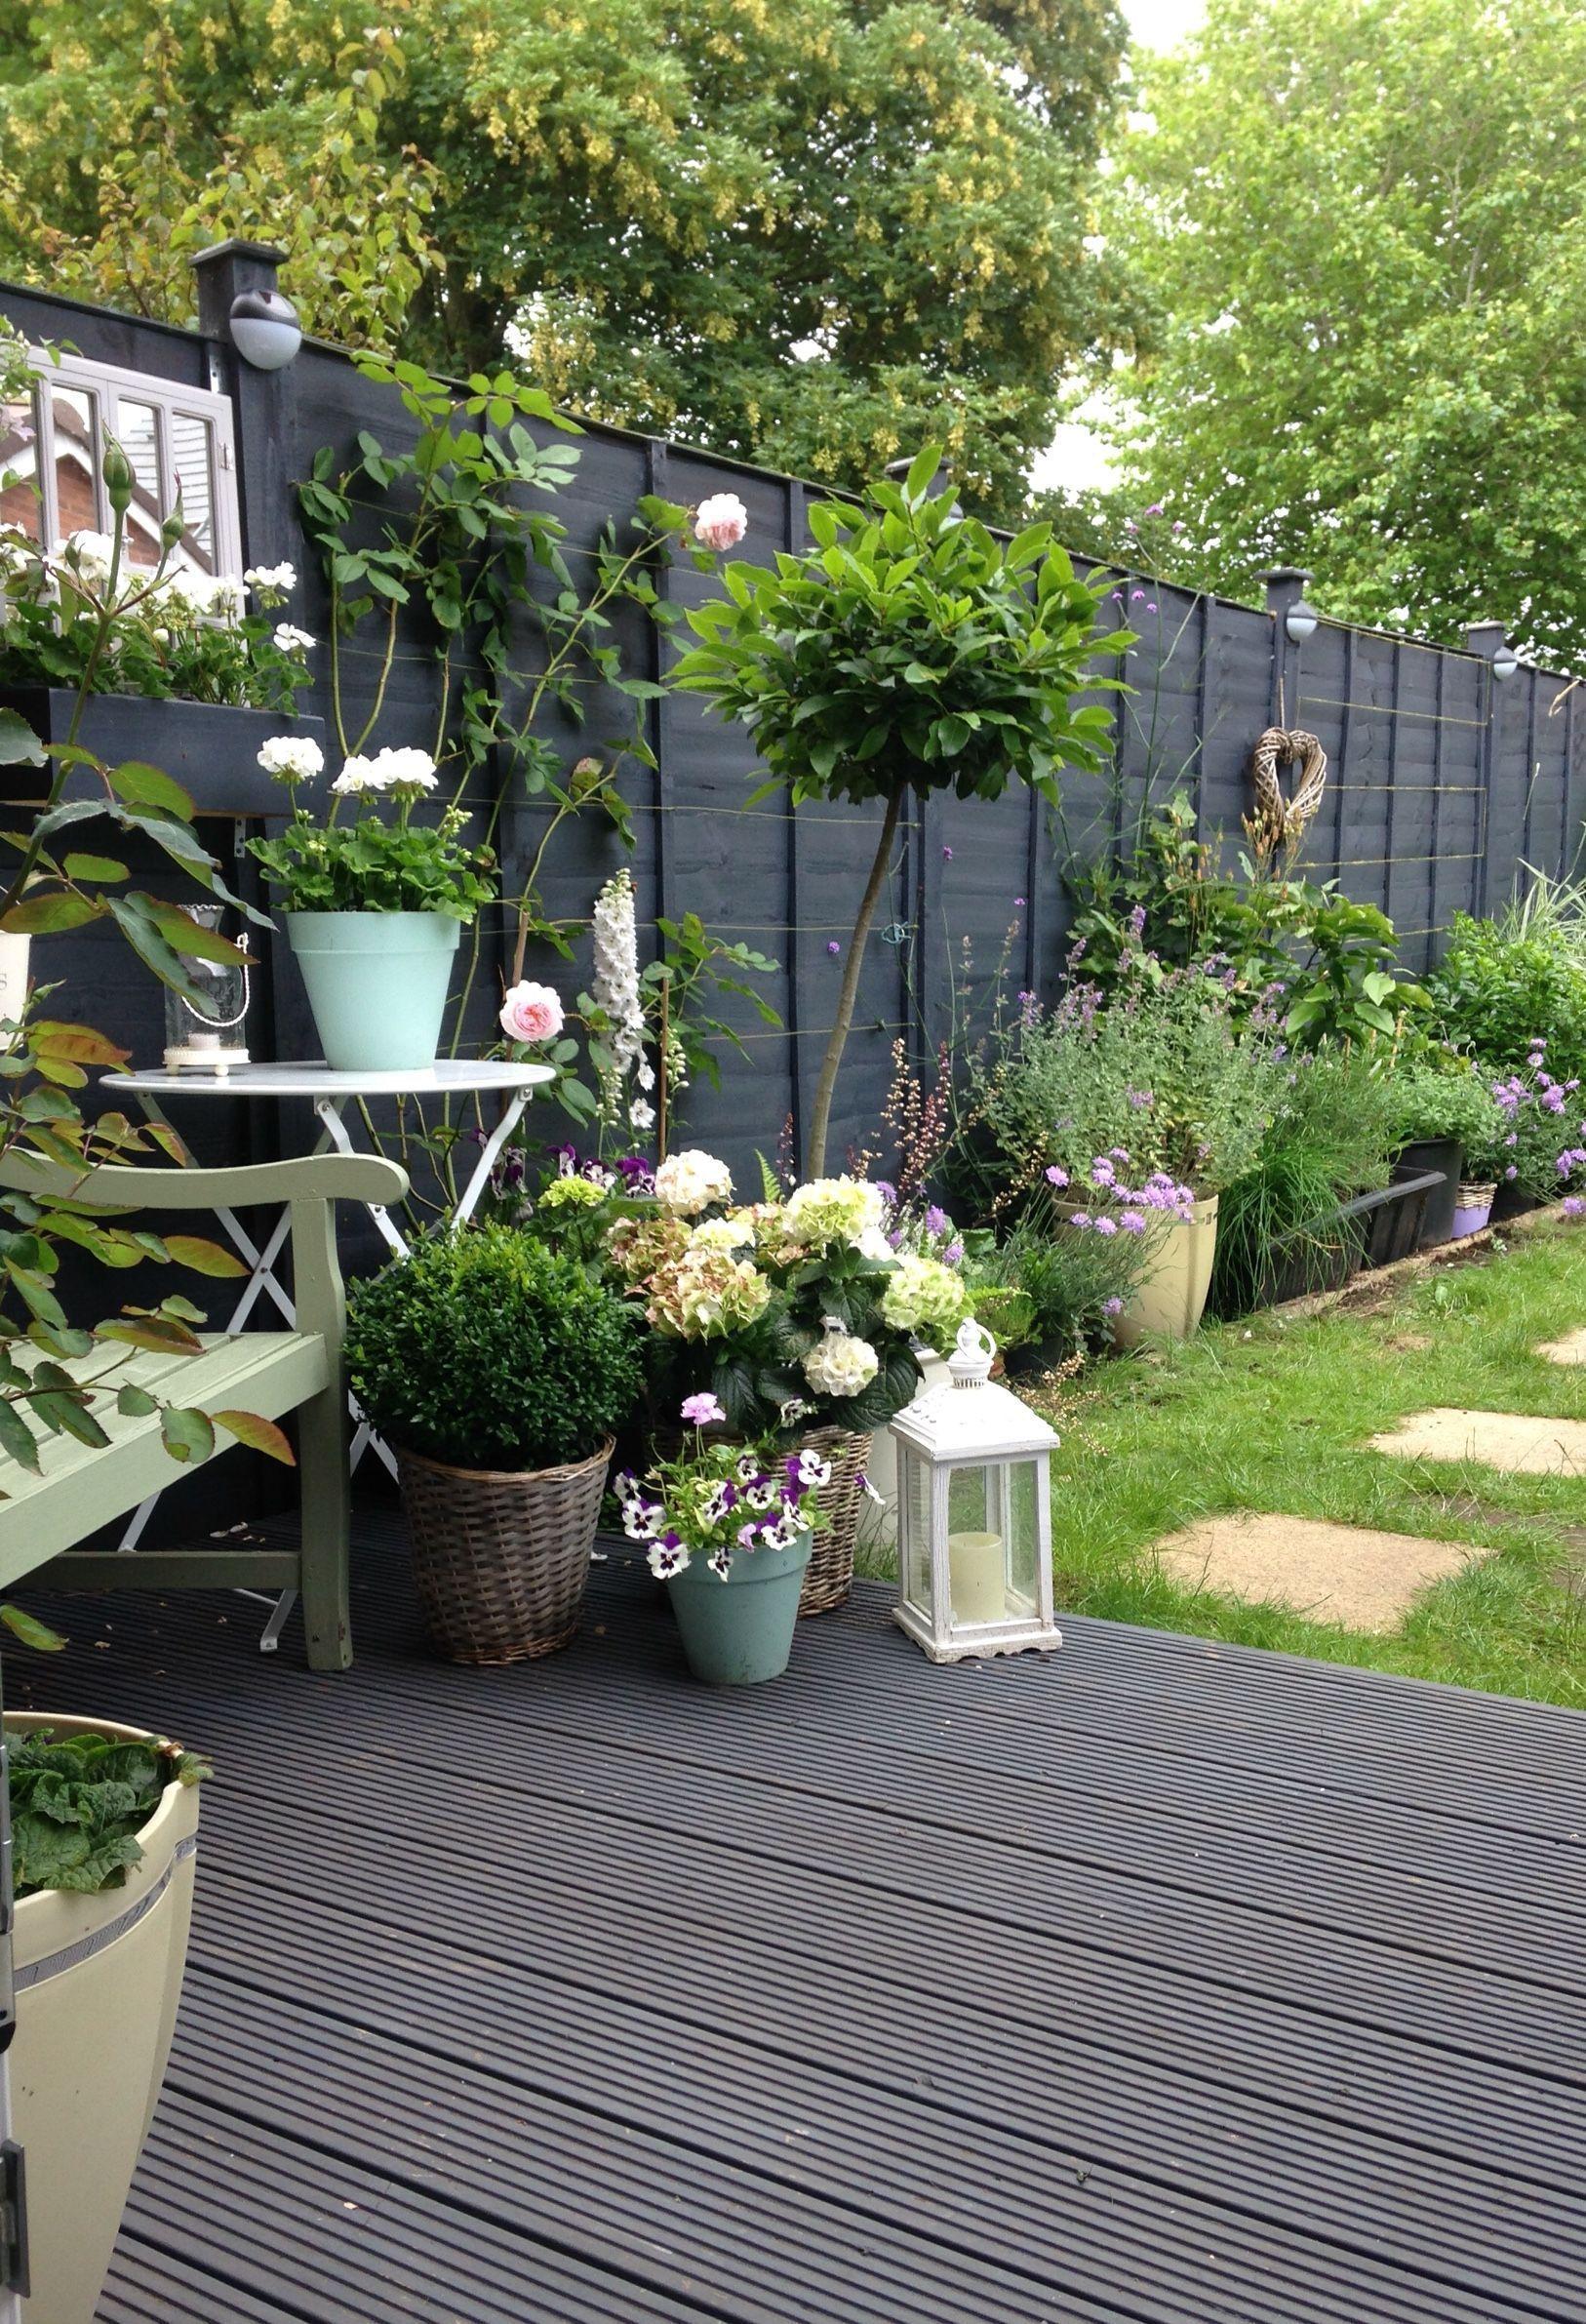 Amazing Garden Landscaping Ideas And Designs Anifa Blog In 2021 Garden Design Small Gardens Small Garden Design